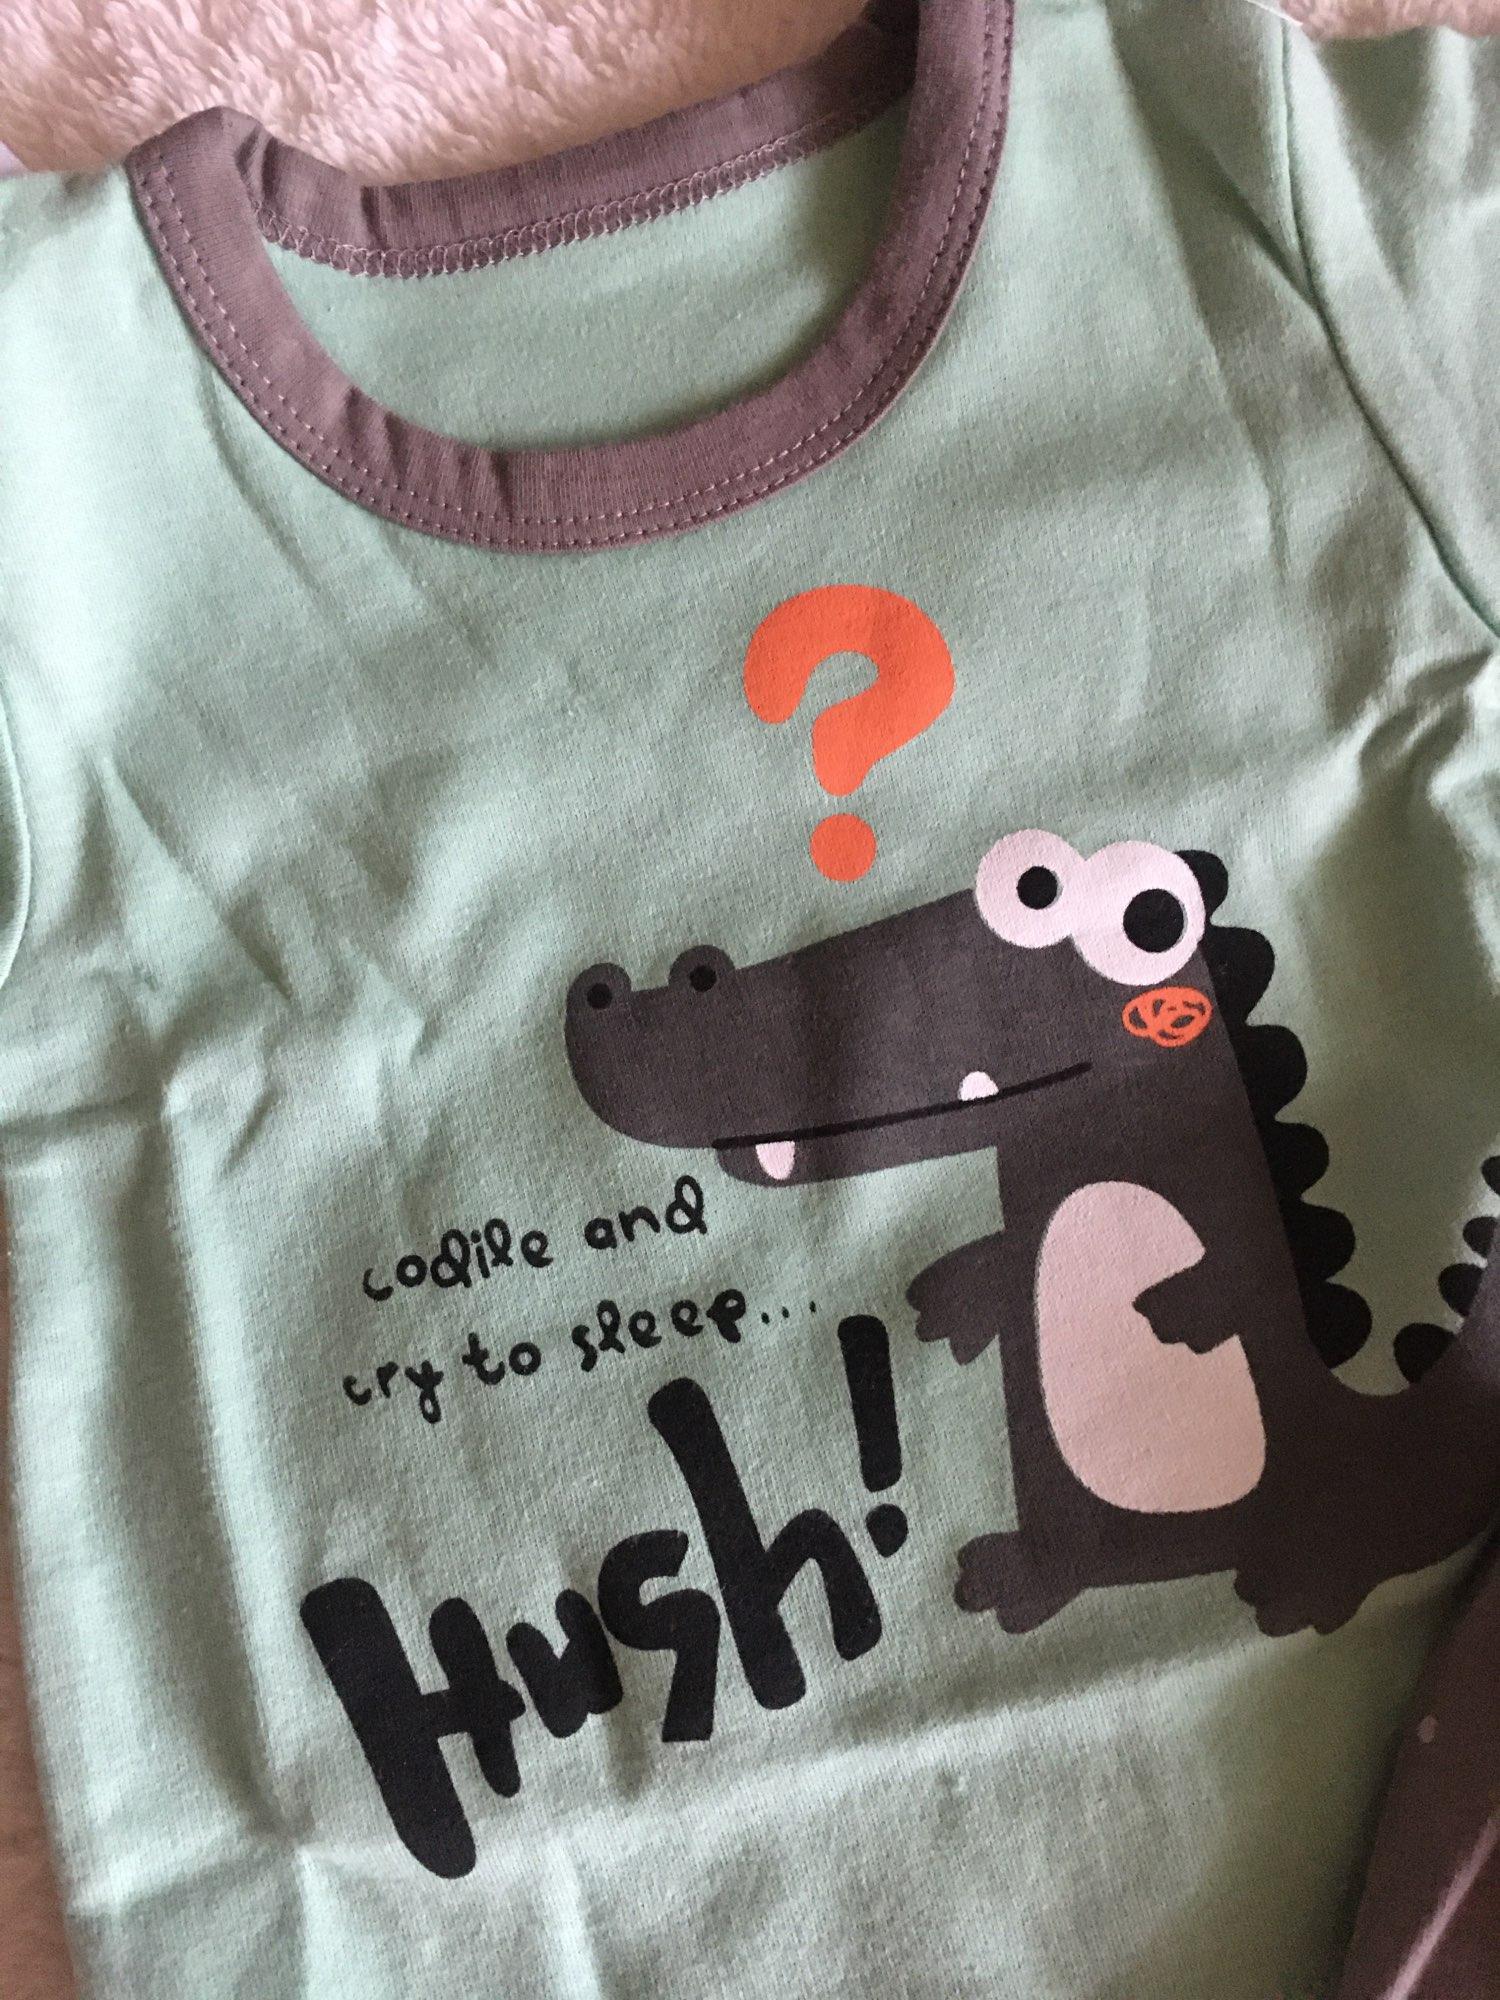 Pijama Sets Unisex 6M-5Y Children's Suits Boys Children Clothes Kids Baby pajamas Sets Sleepwear Kids Clothes Girls photo review